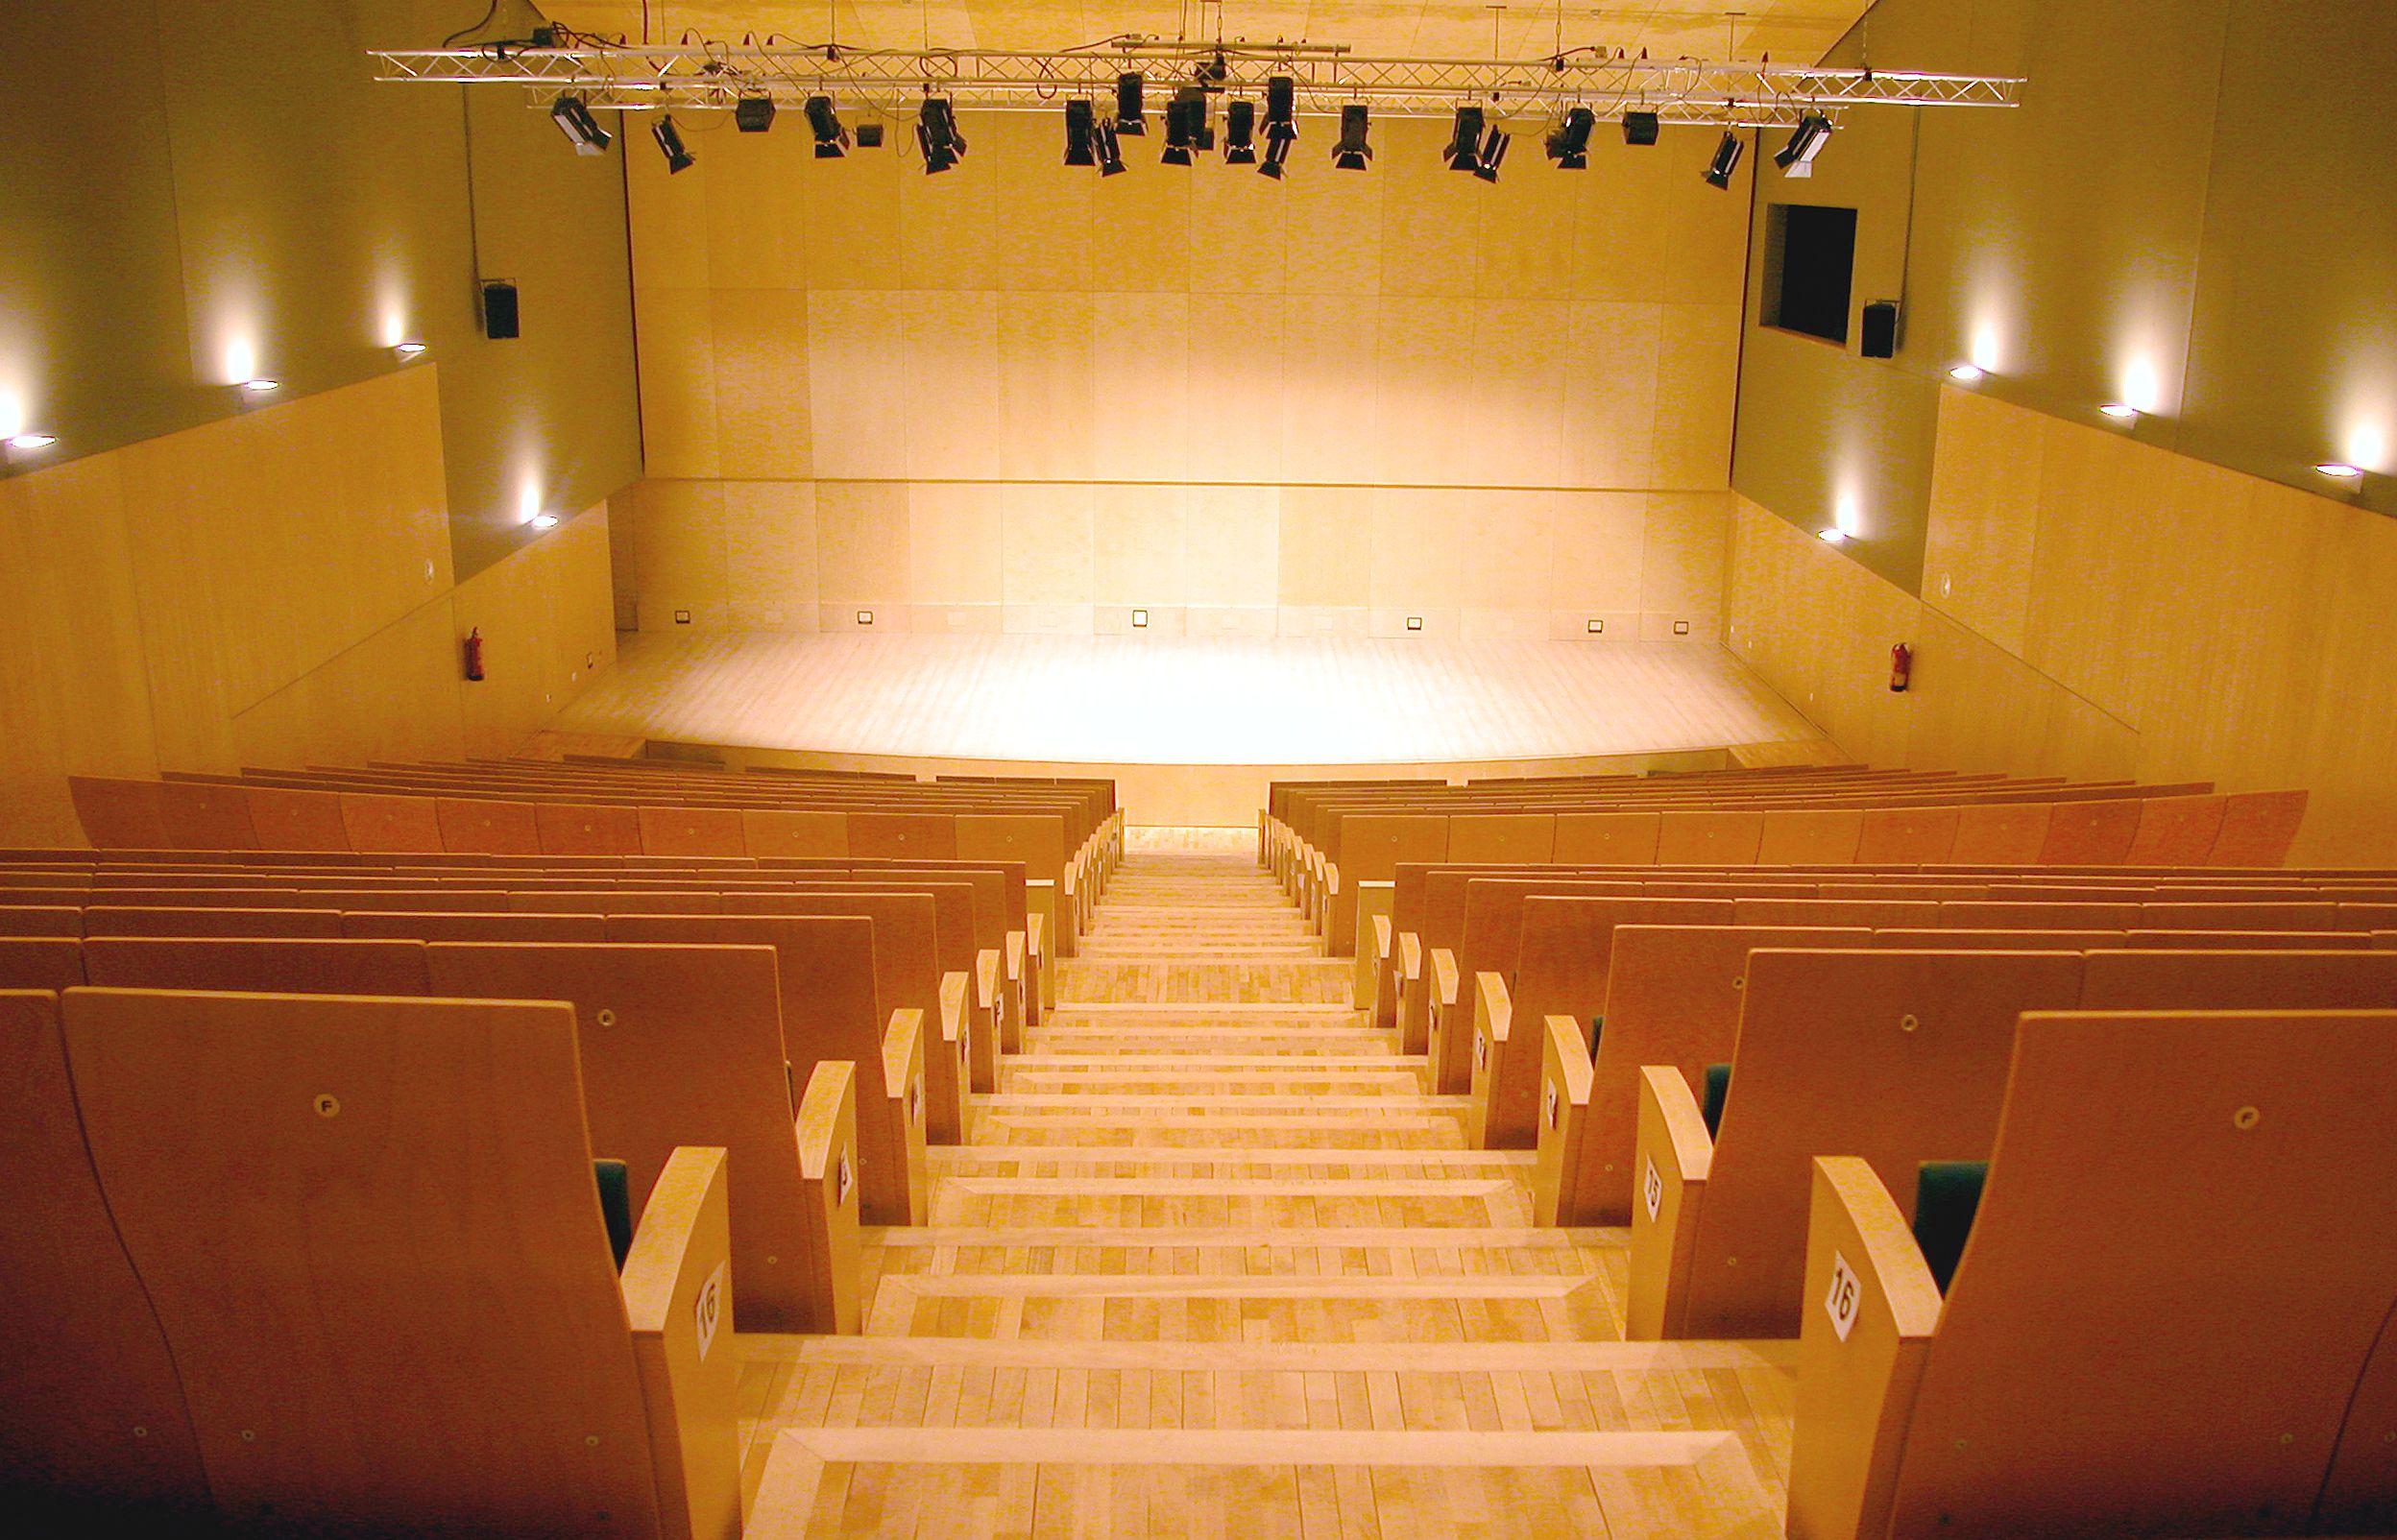 Auditori Municipal de Terrassa | Aj. Terrassa